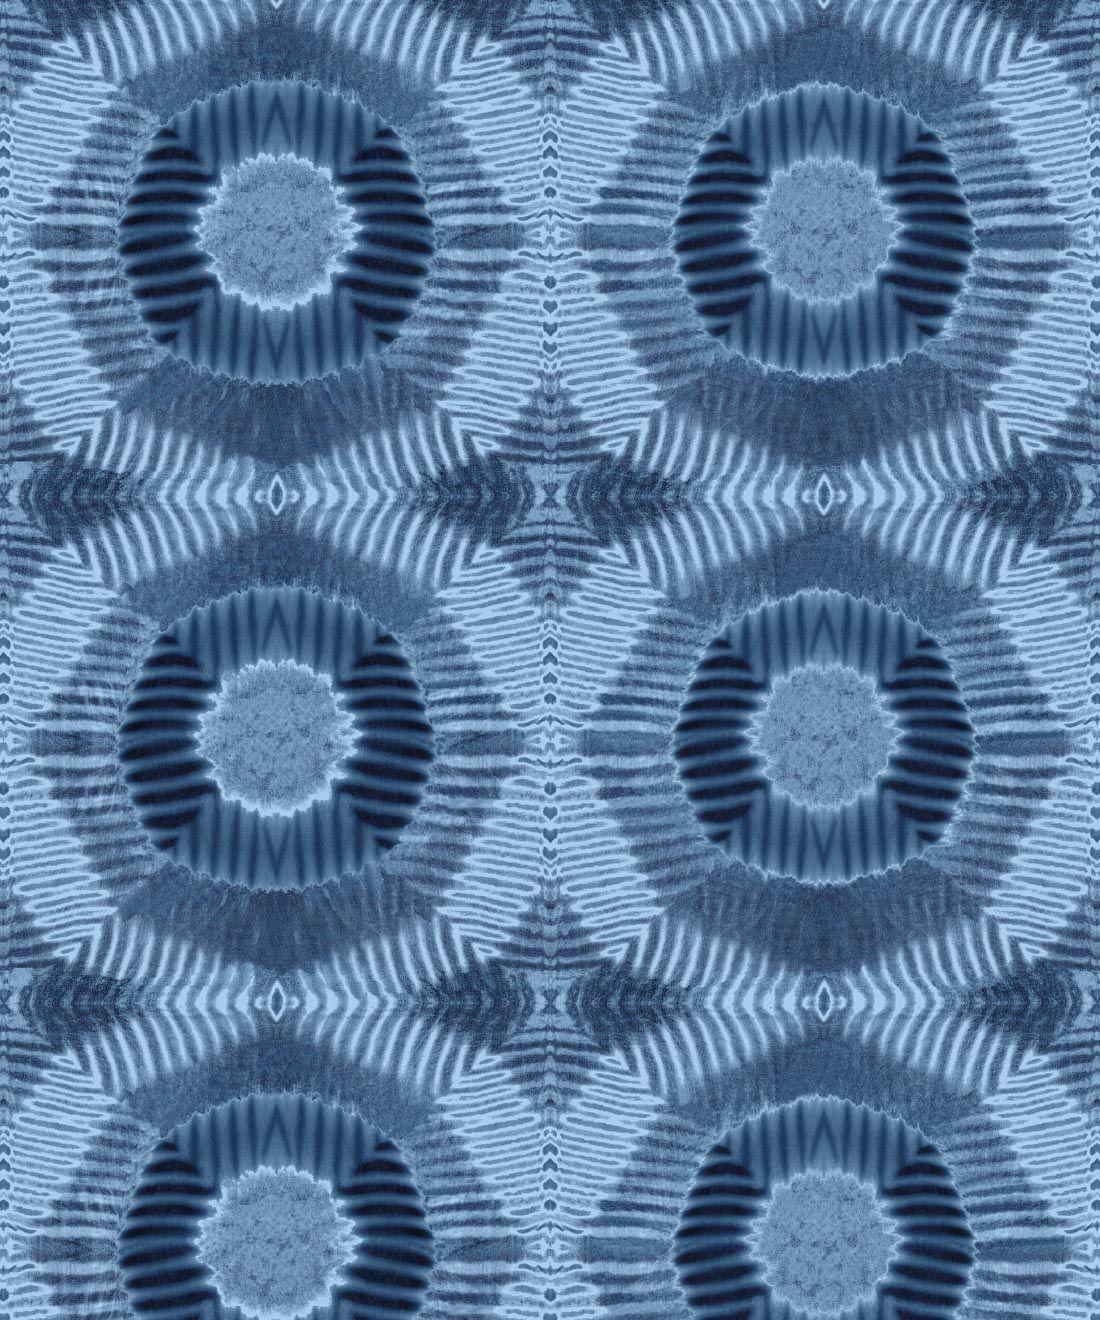 Aztec Suns Wallpaper Indigo Blue • Shibori Geometric • Swatch